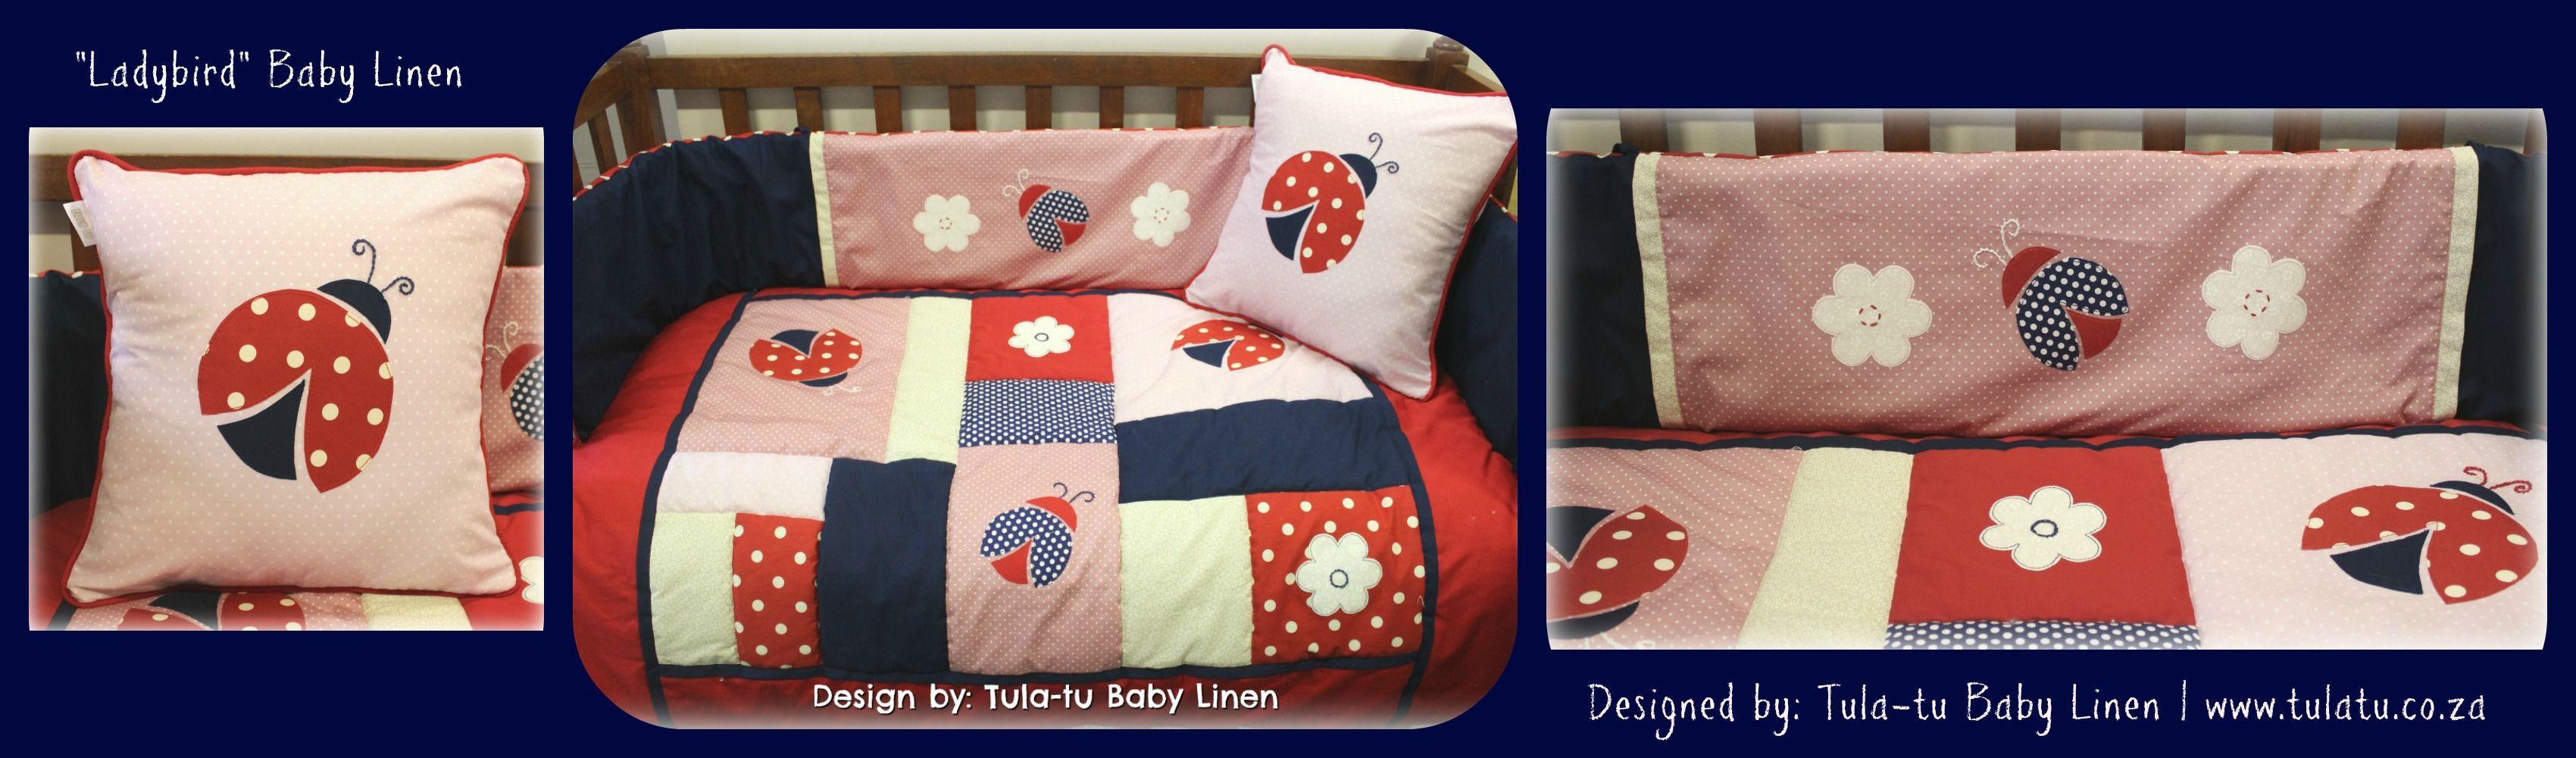 Baby cribs co za - Ladybird Ladybug Cot Linen Crib Linen Baby Linen Nursery Linen Designed By